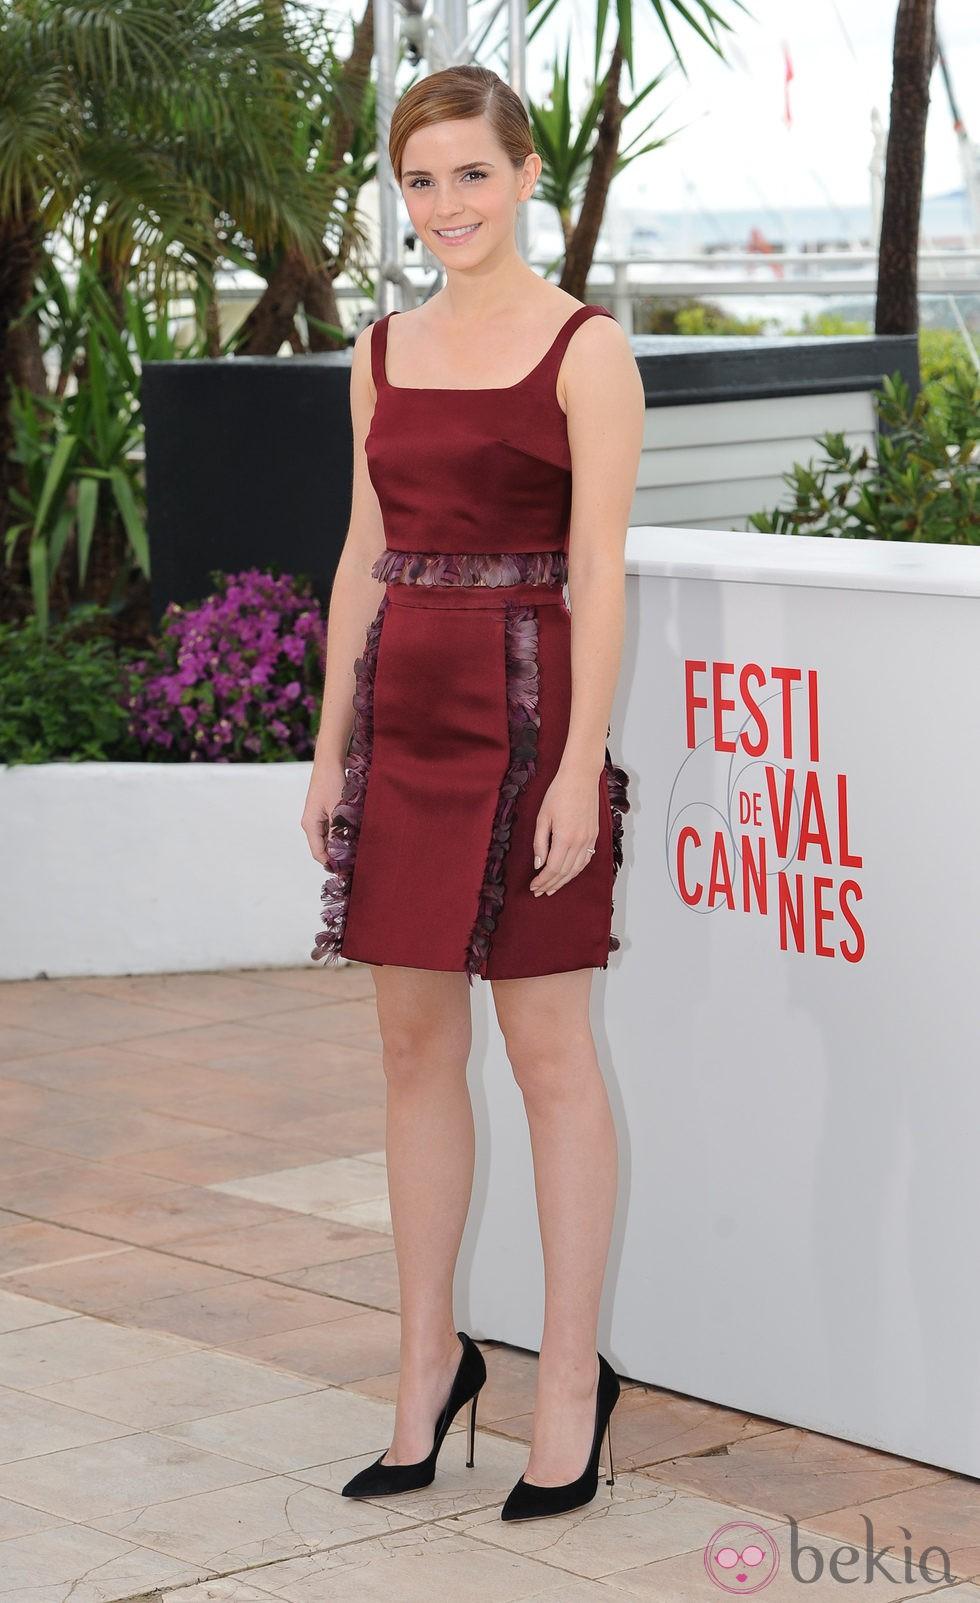 Emma Watson en el photocall de 'The Bling Ring' en el Festival de Cannes 2013